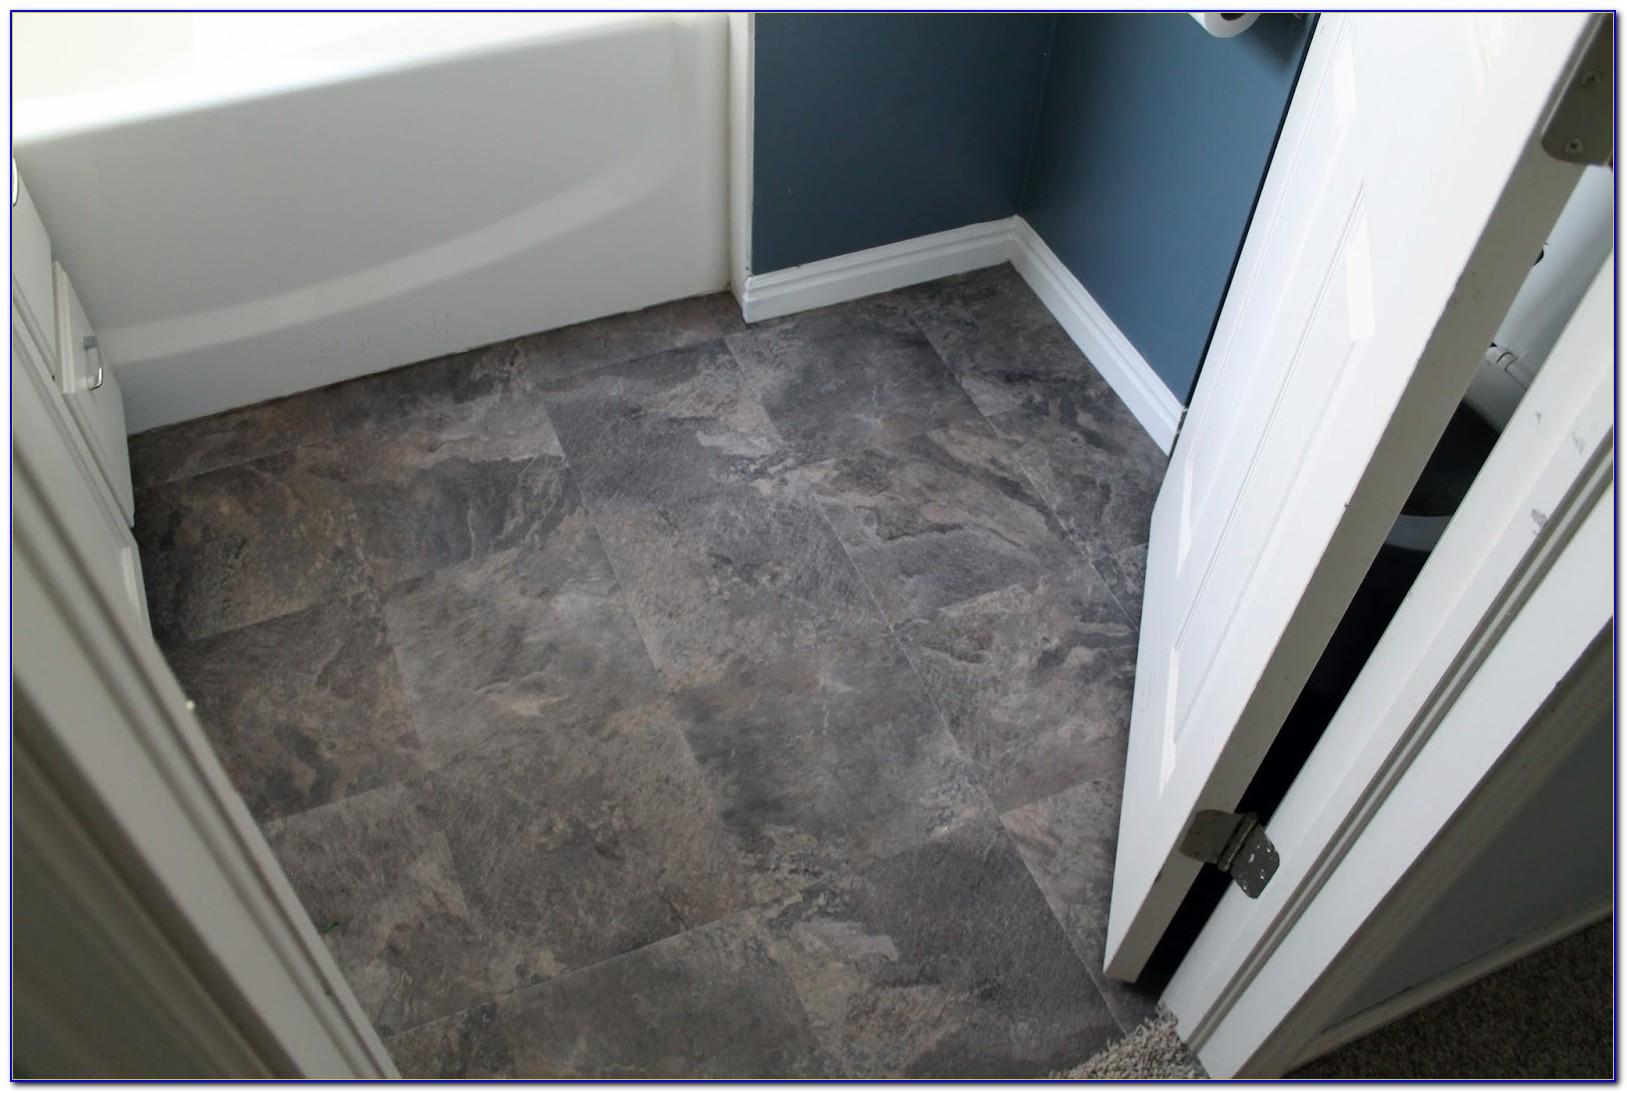 Peel And Stick Floor Tiles That Look Like Wood